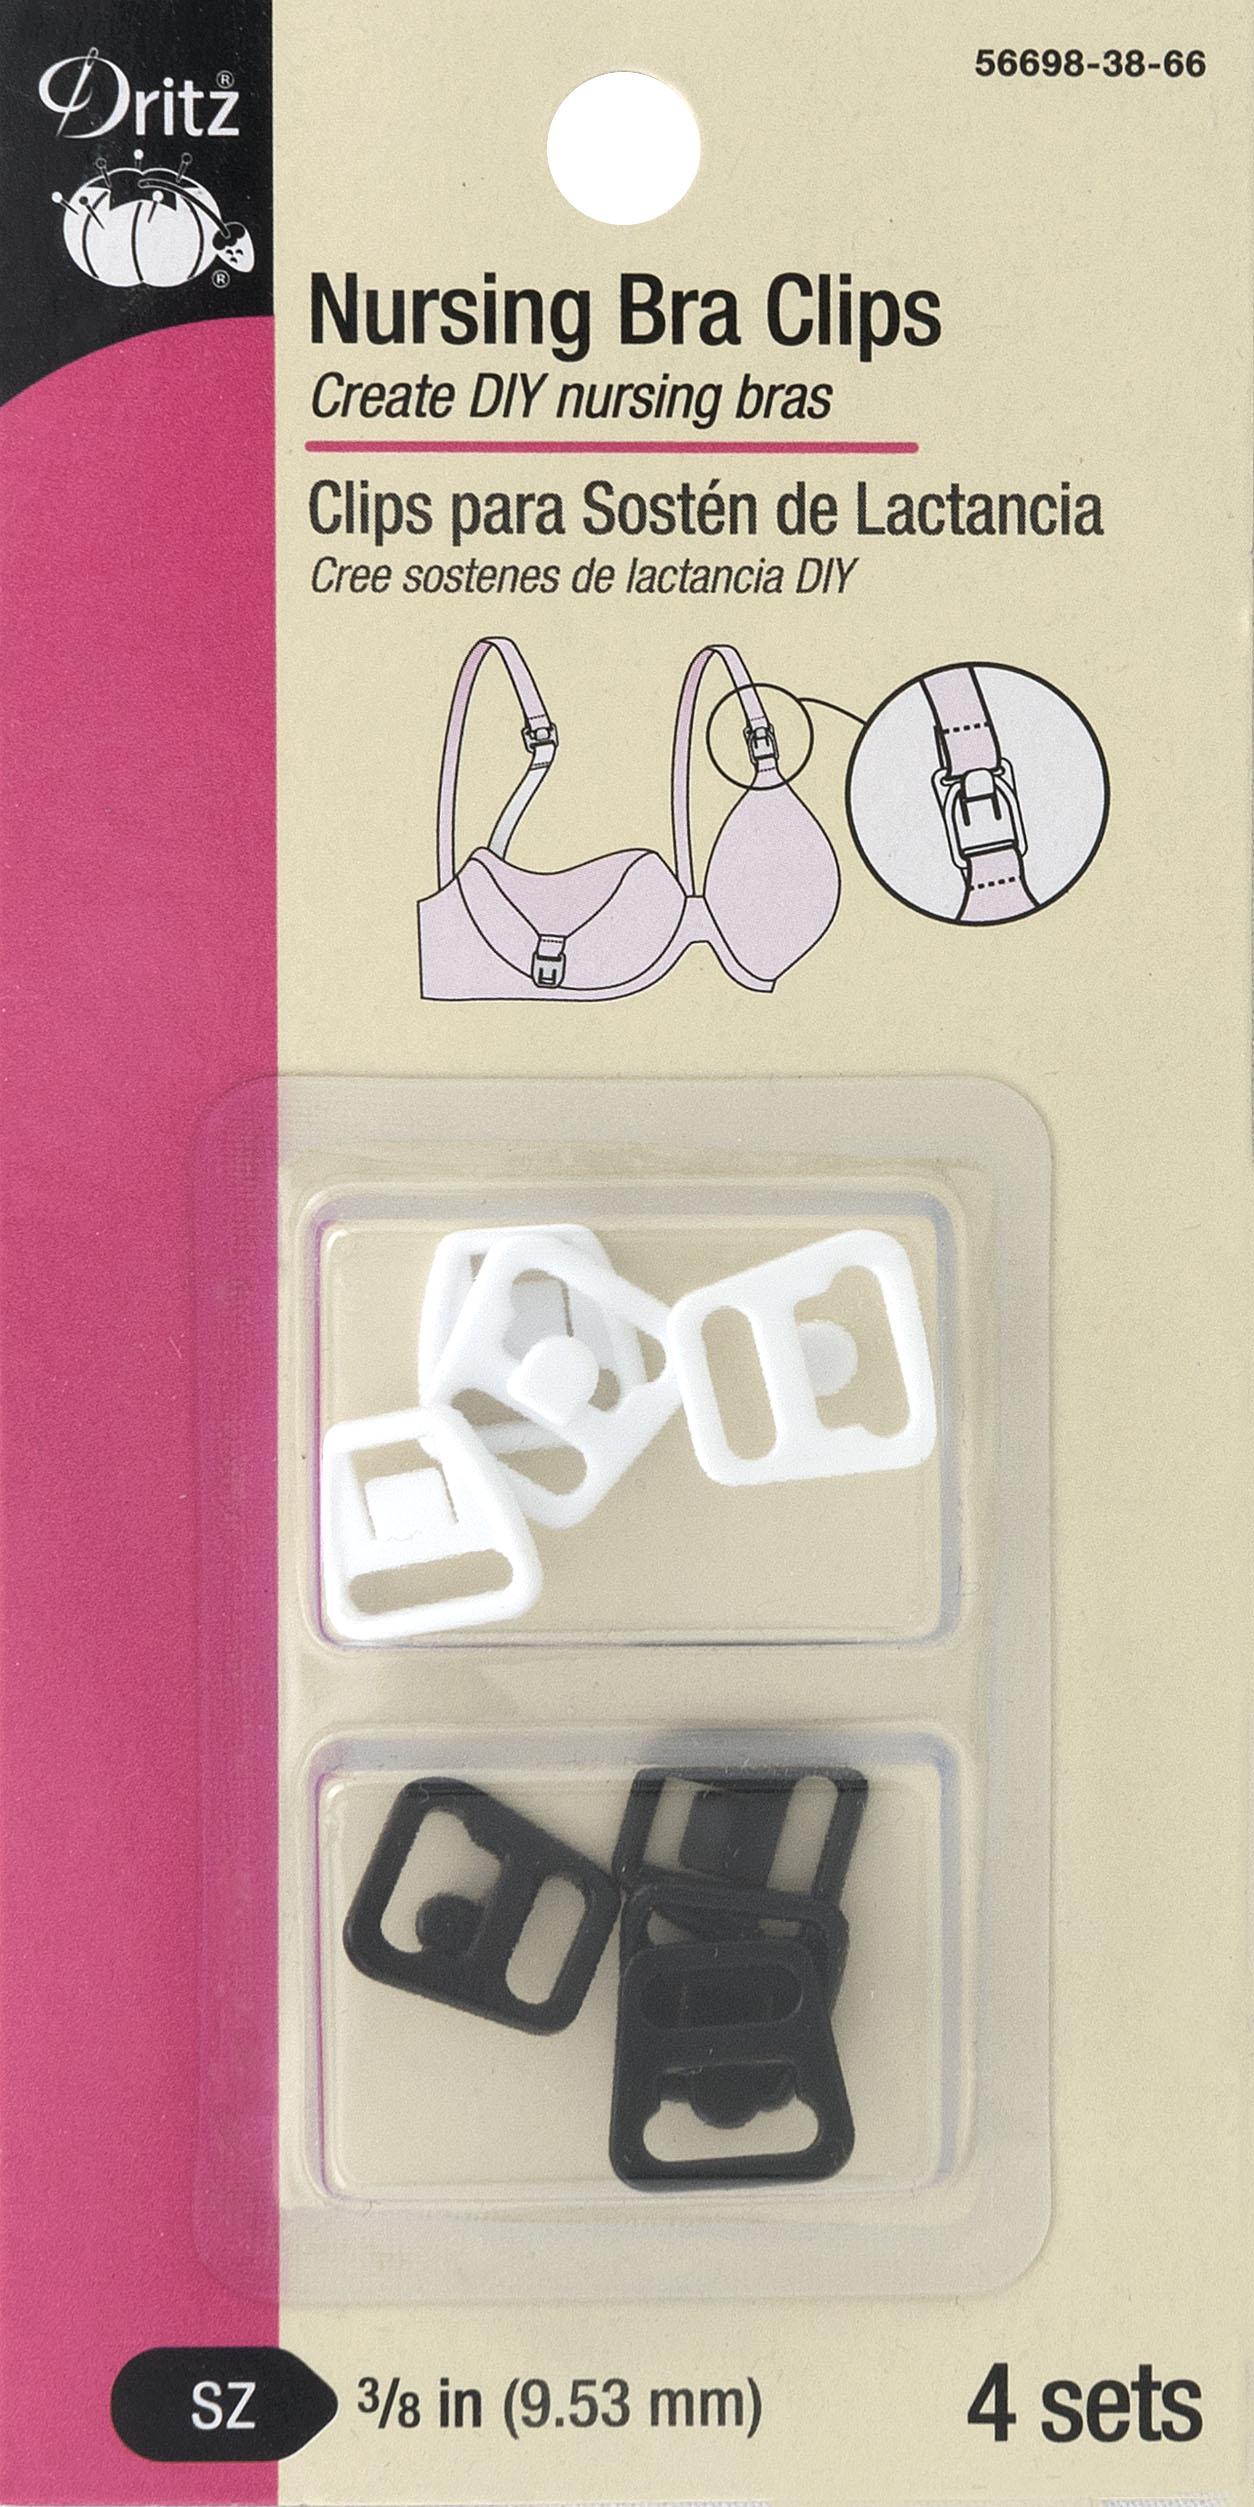 Dritz - Nursing Bra Clips - 3/8 (4 sets)